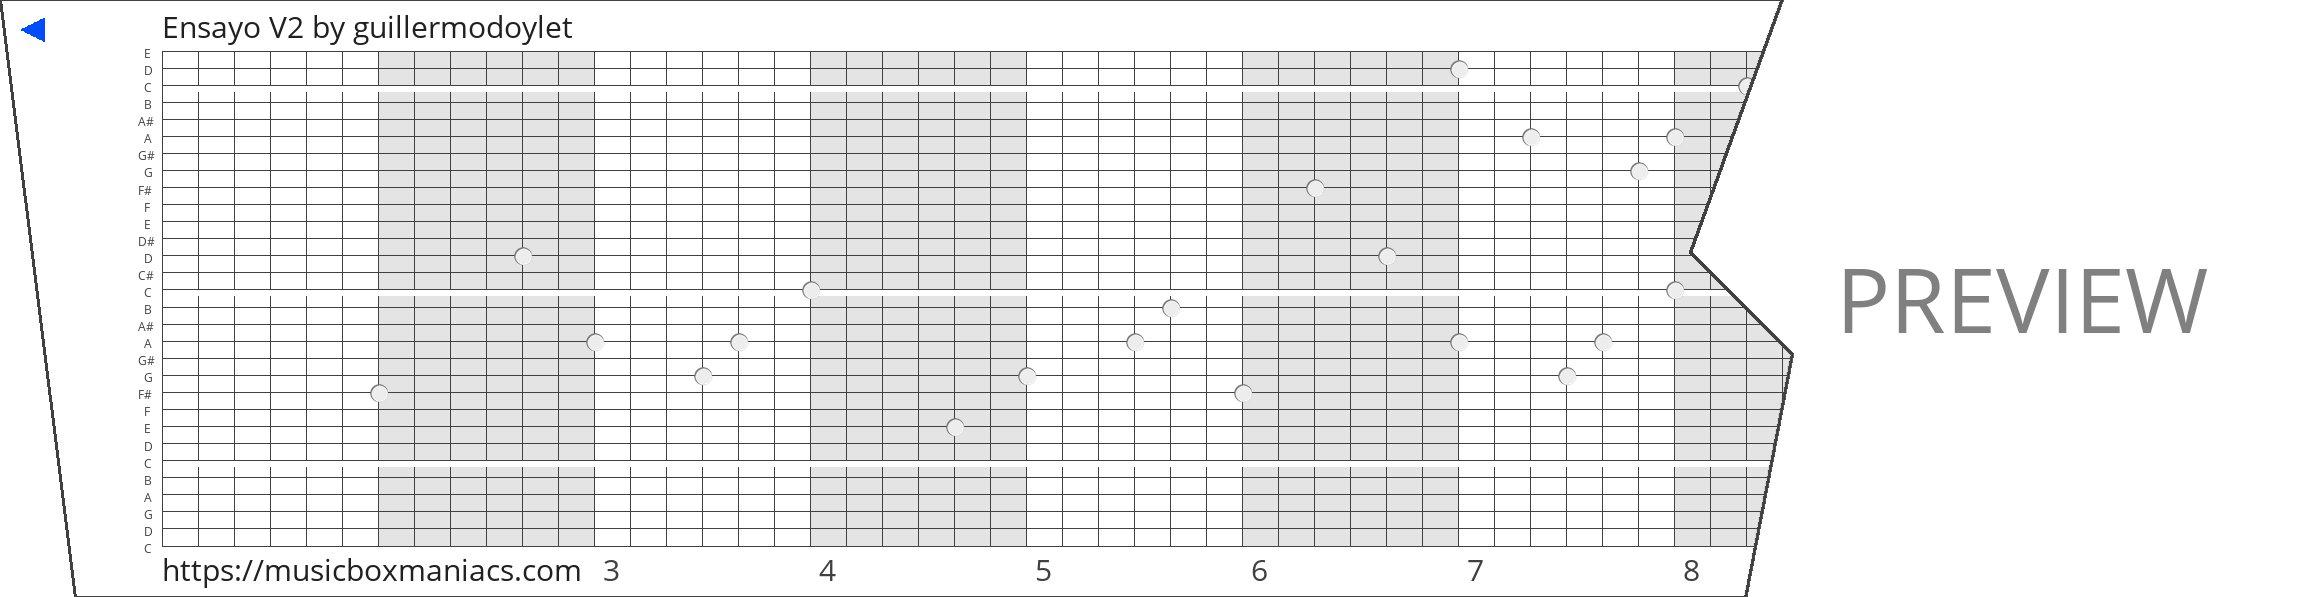 Ensayo V2 30 note music box paper strip